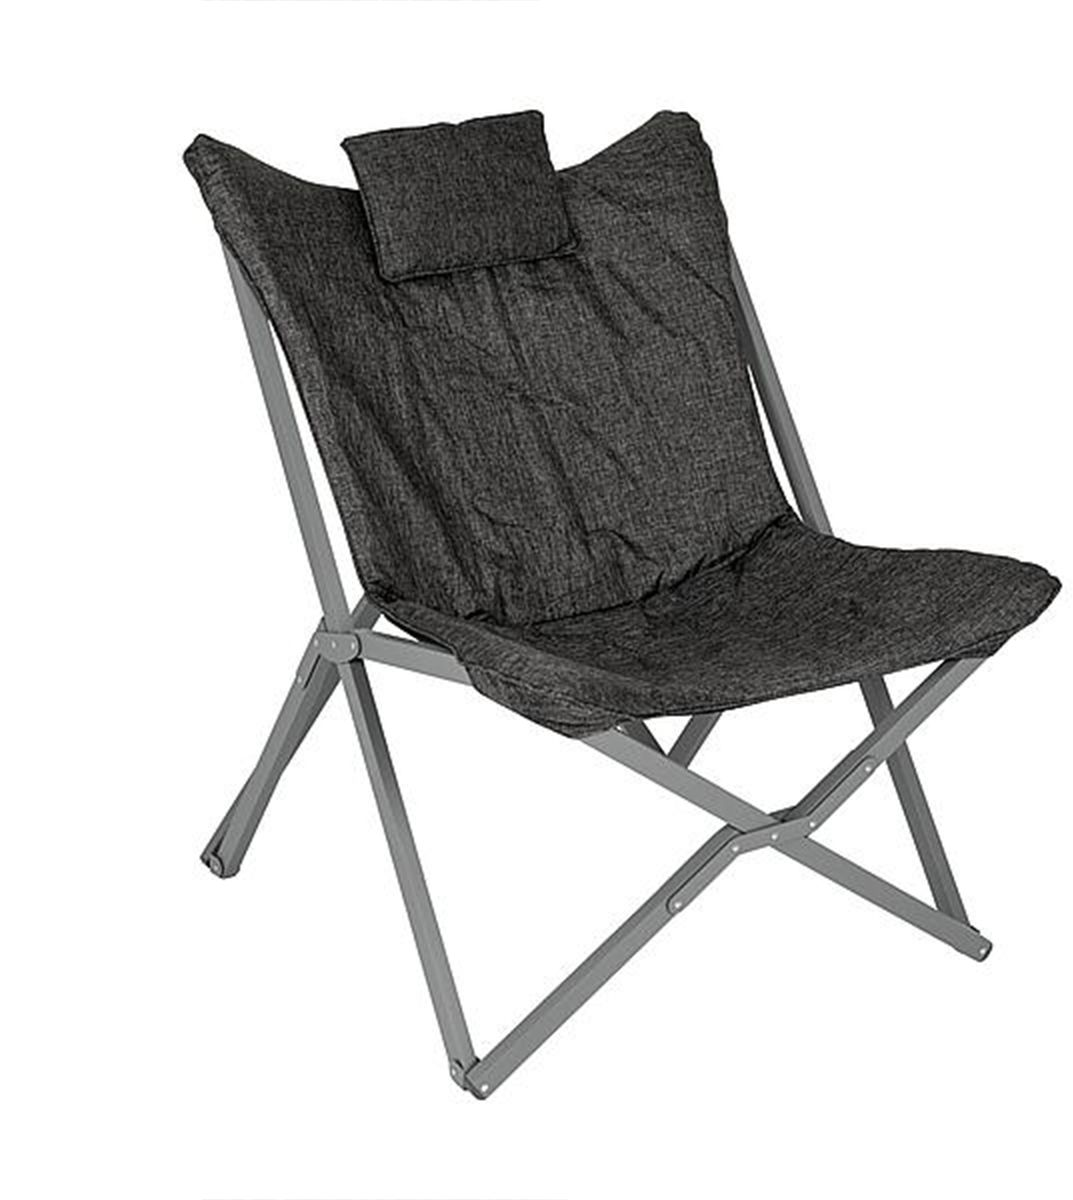 Krzesło kempingowe RELAX Edmonton